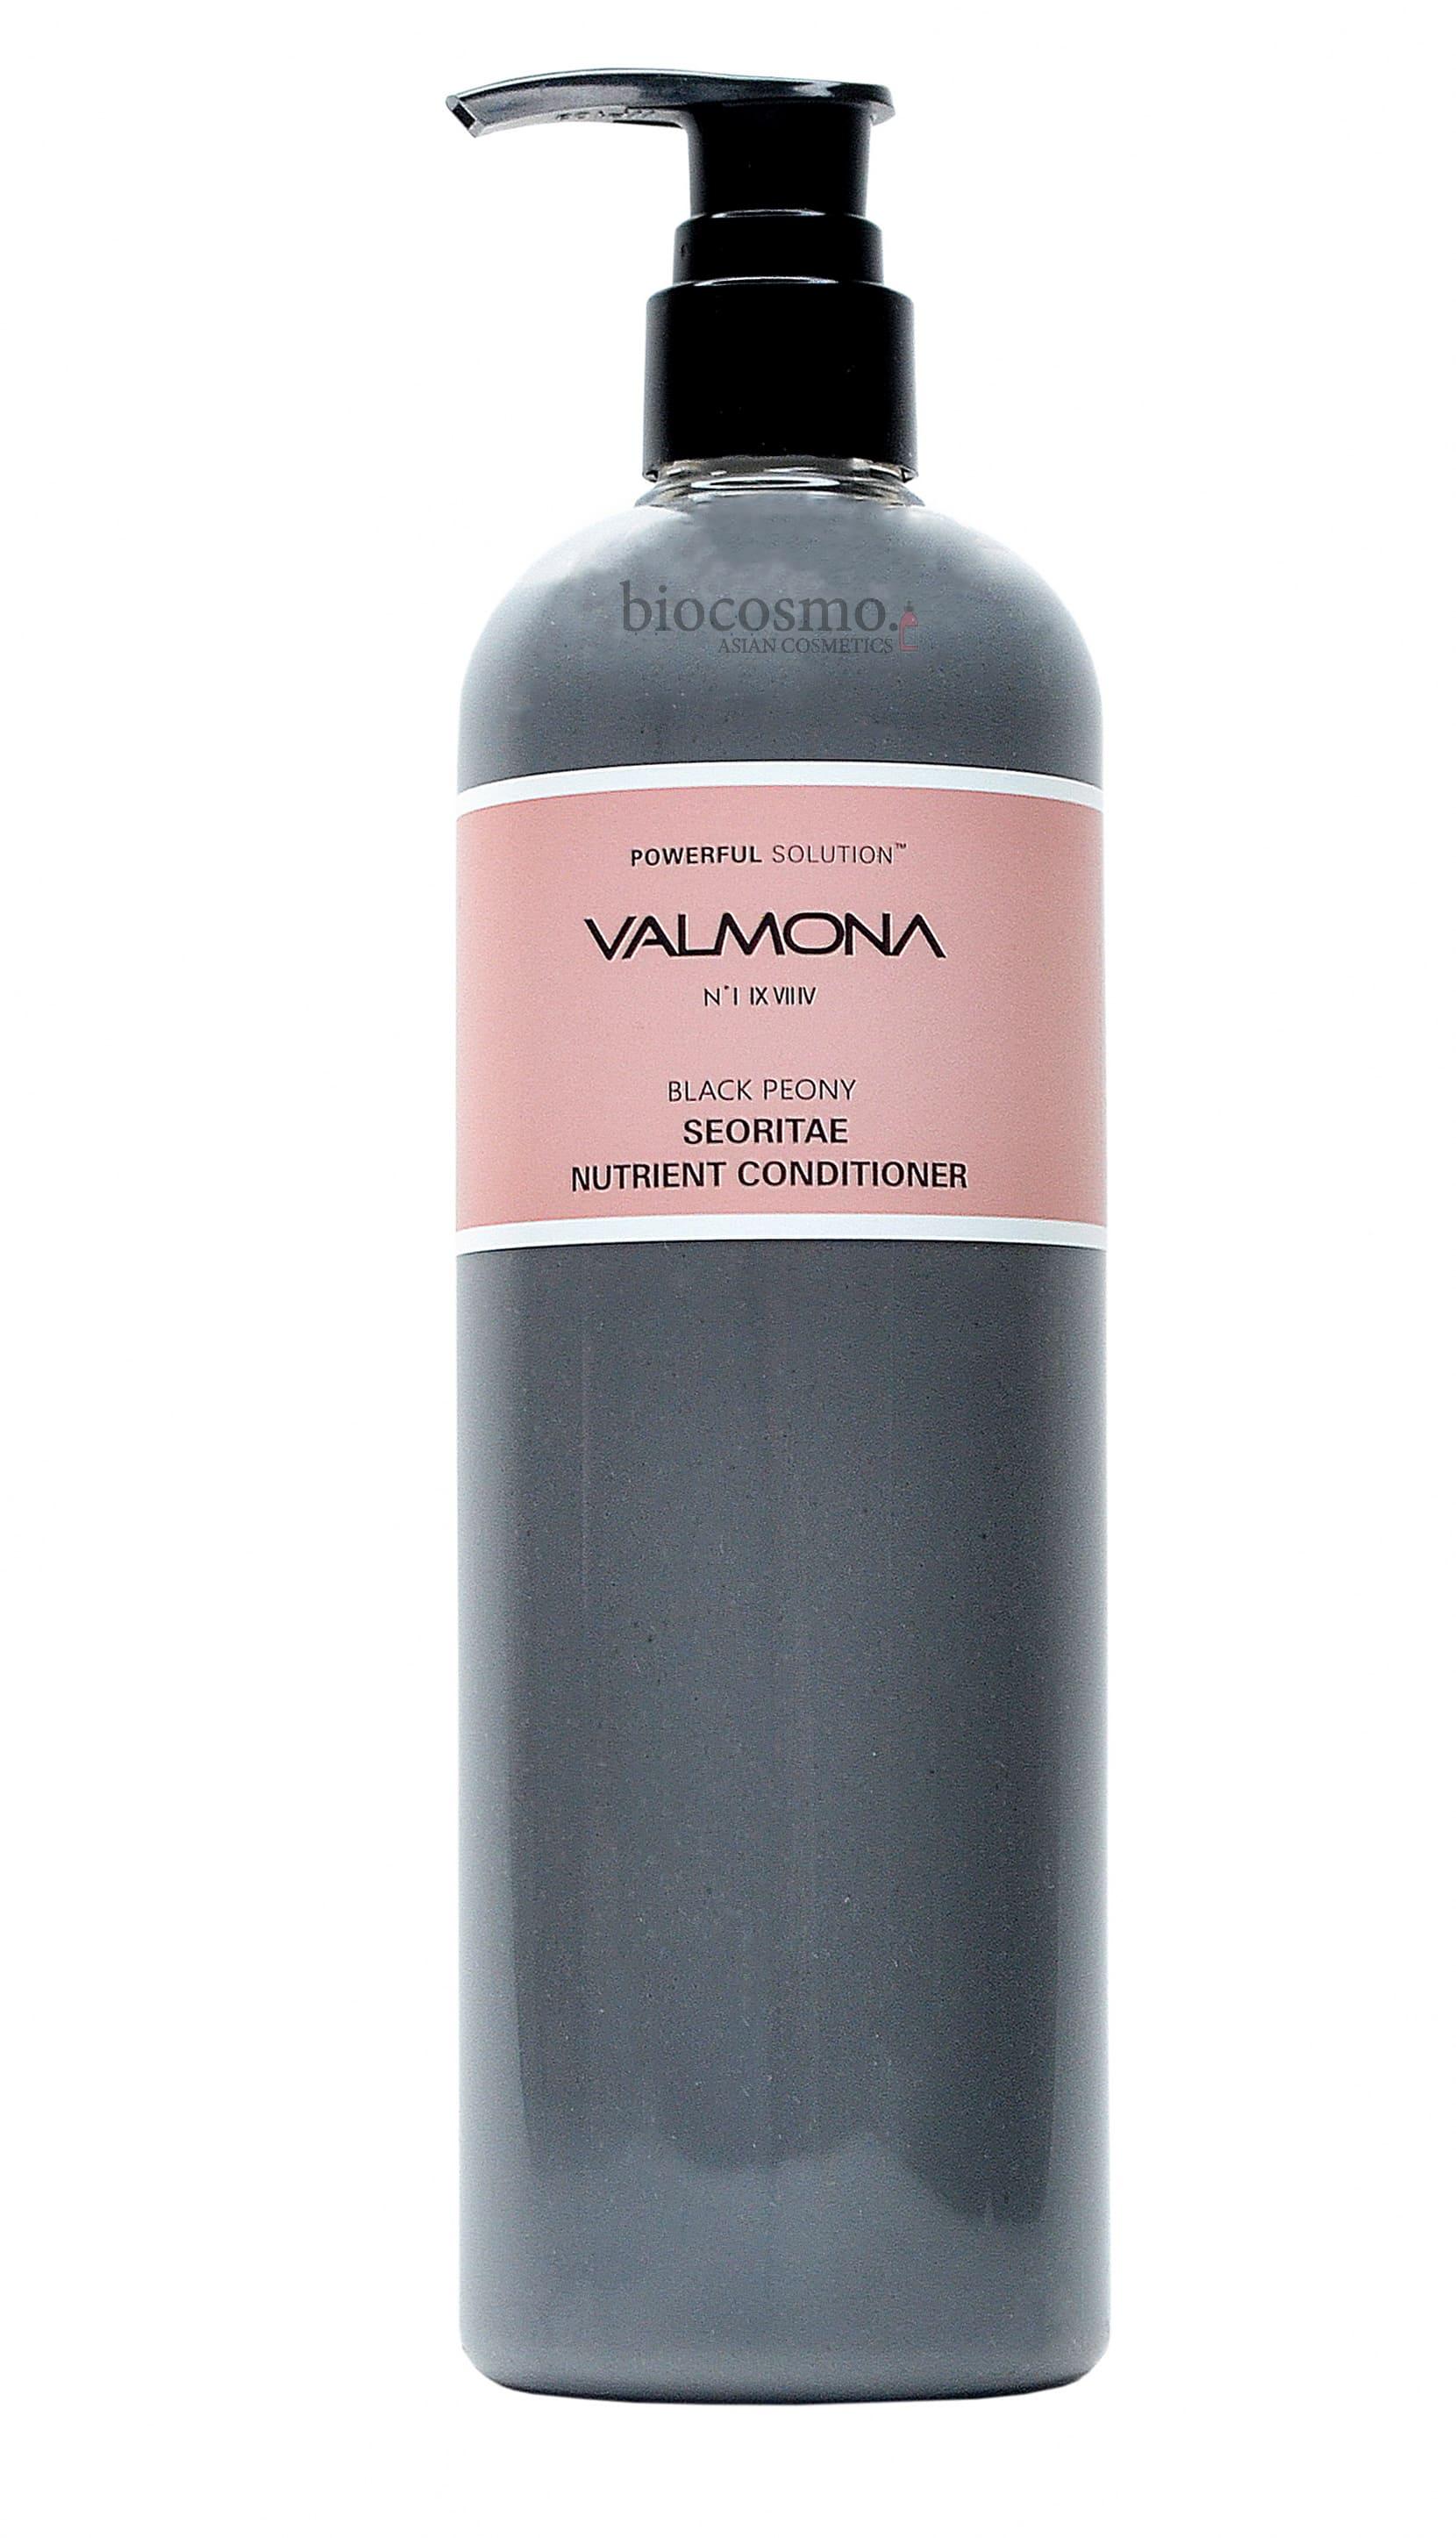 Укрепляющий кондиционер для волос EVAS Valmona Black Peony Seoritae Nutrient Conditioner - 500 мл